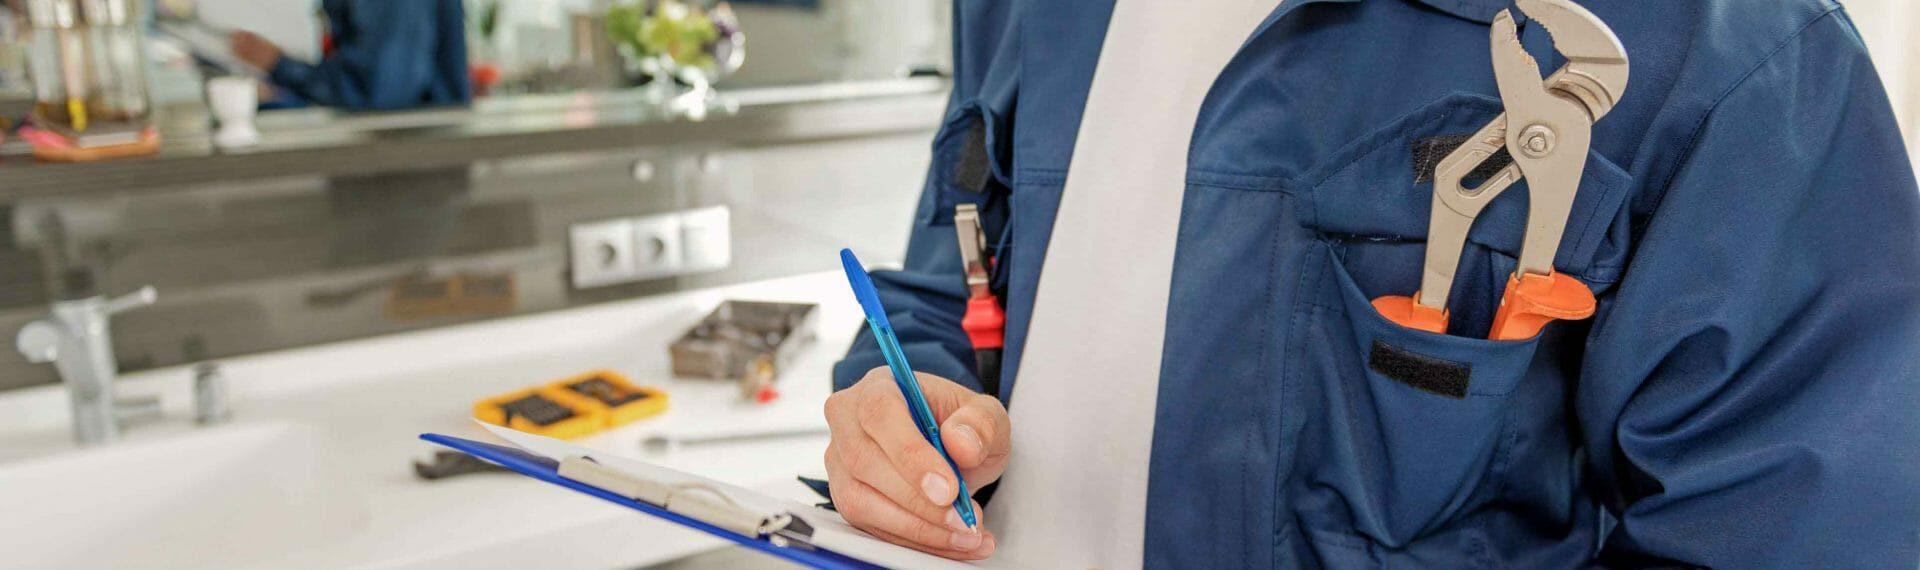 Who needs Handyman Business Insurance?